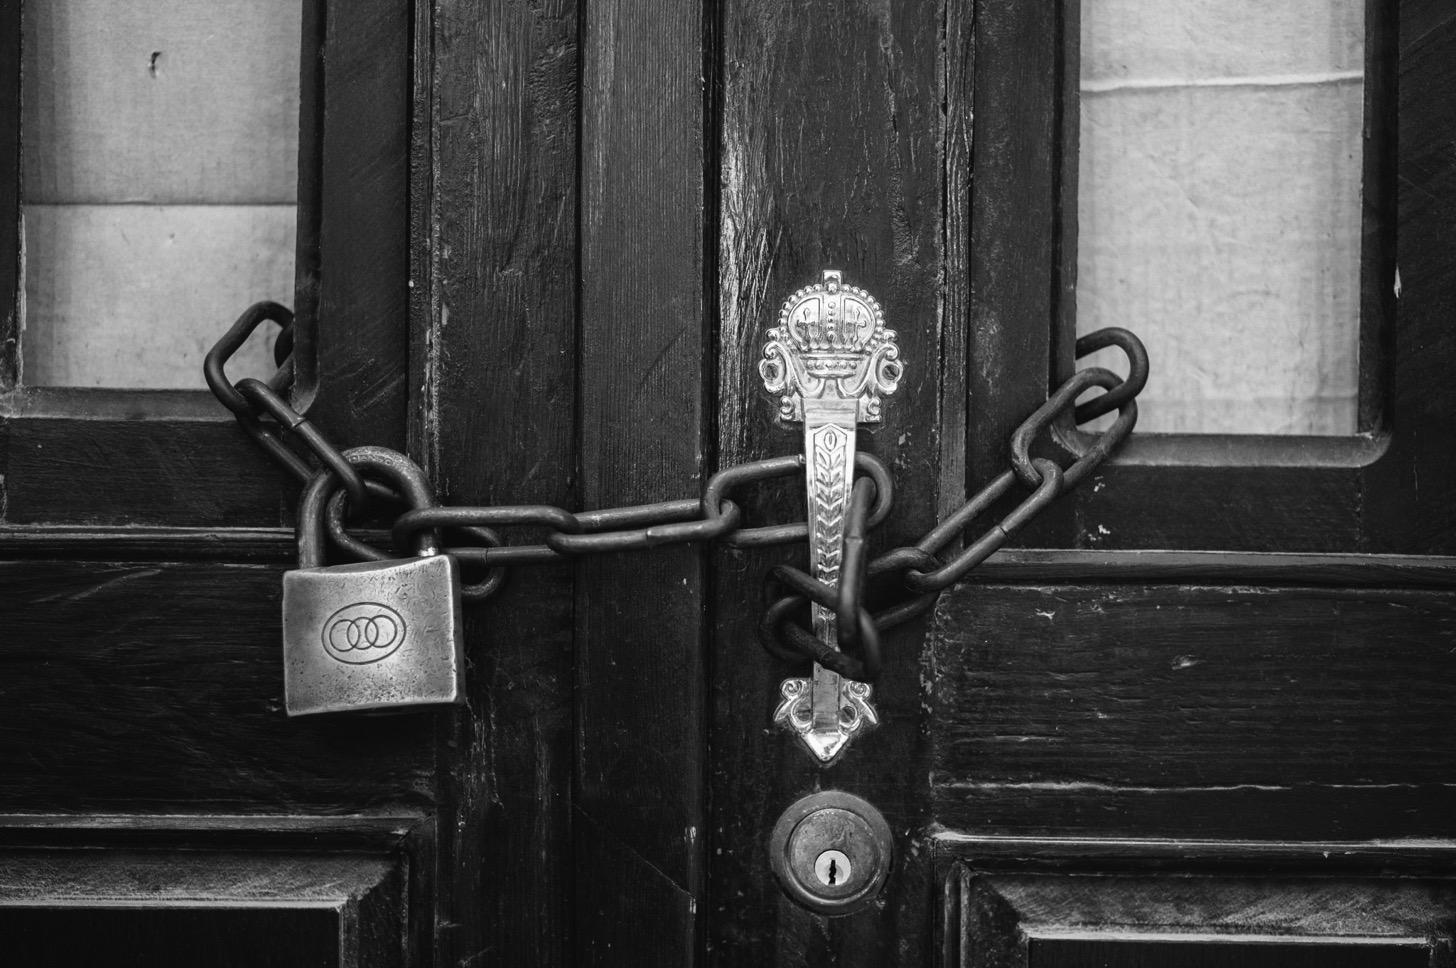 Safariの自動入力されるパスワードを変更する方法。